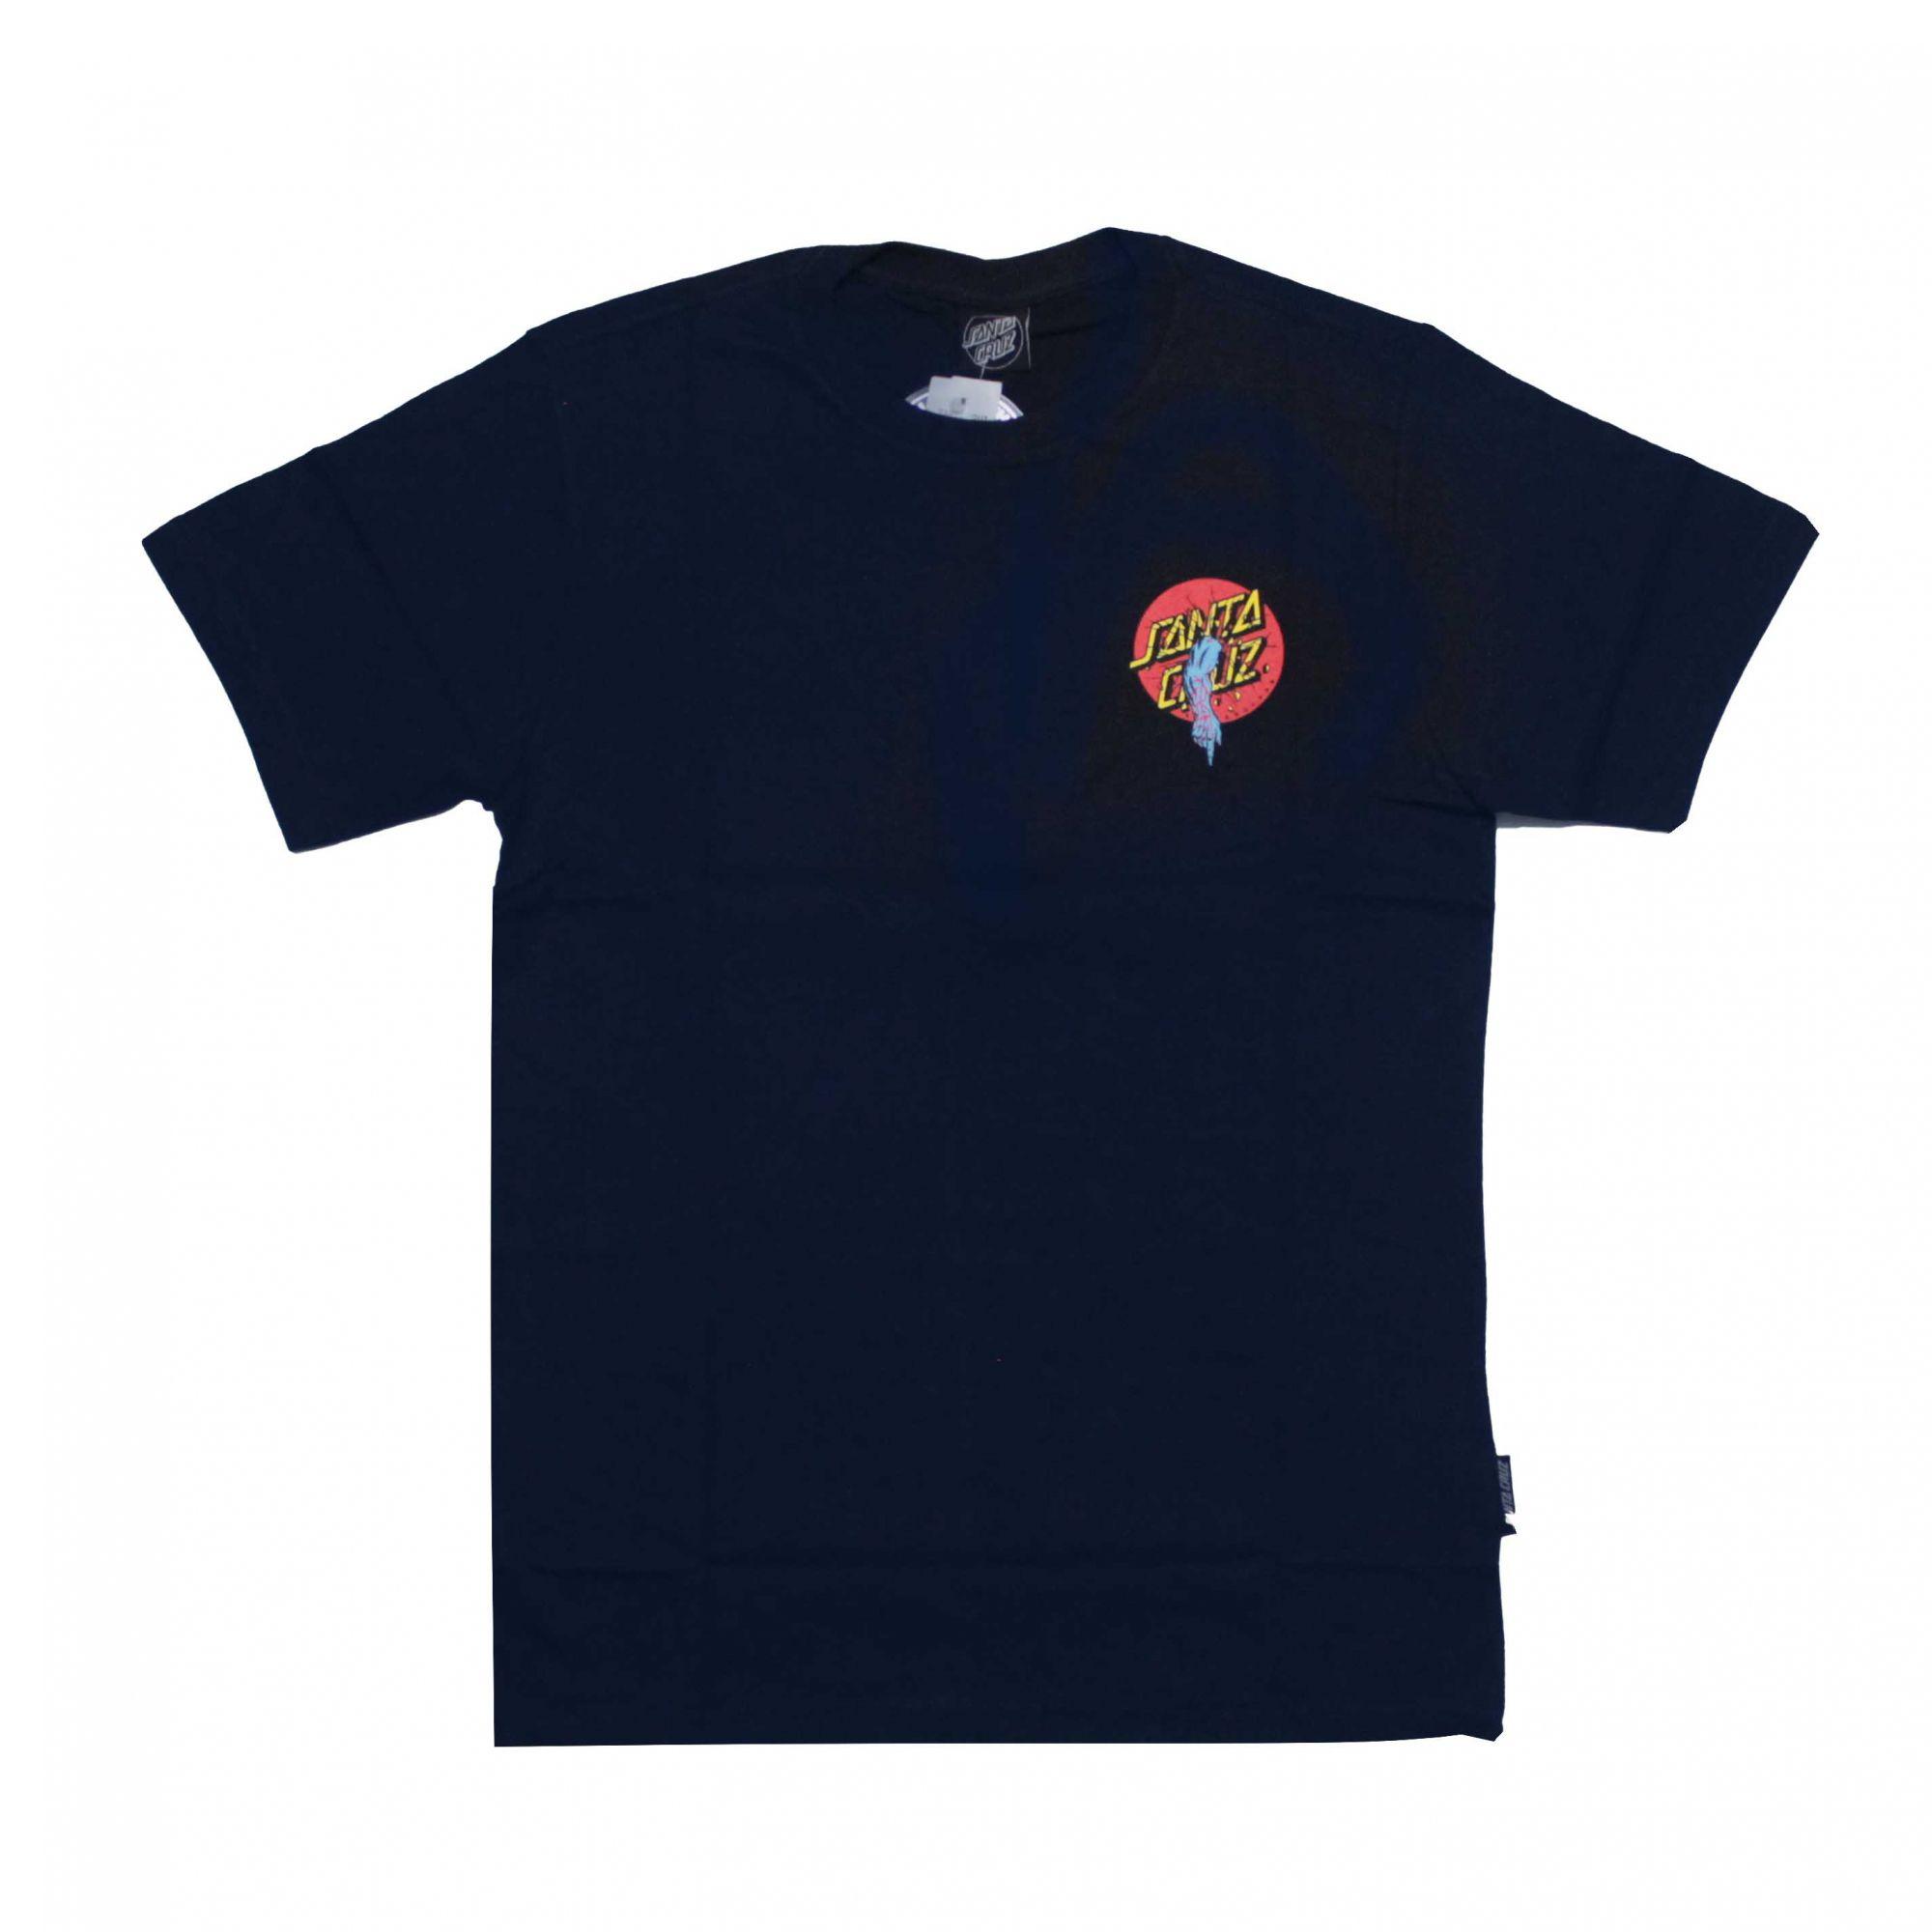 Camiseta Santa Cruz Rob Dot Azul Marinho